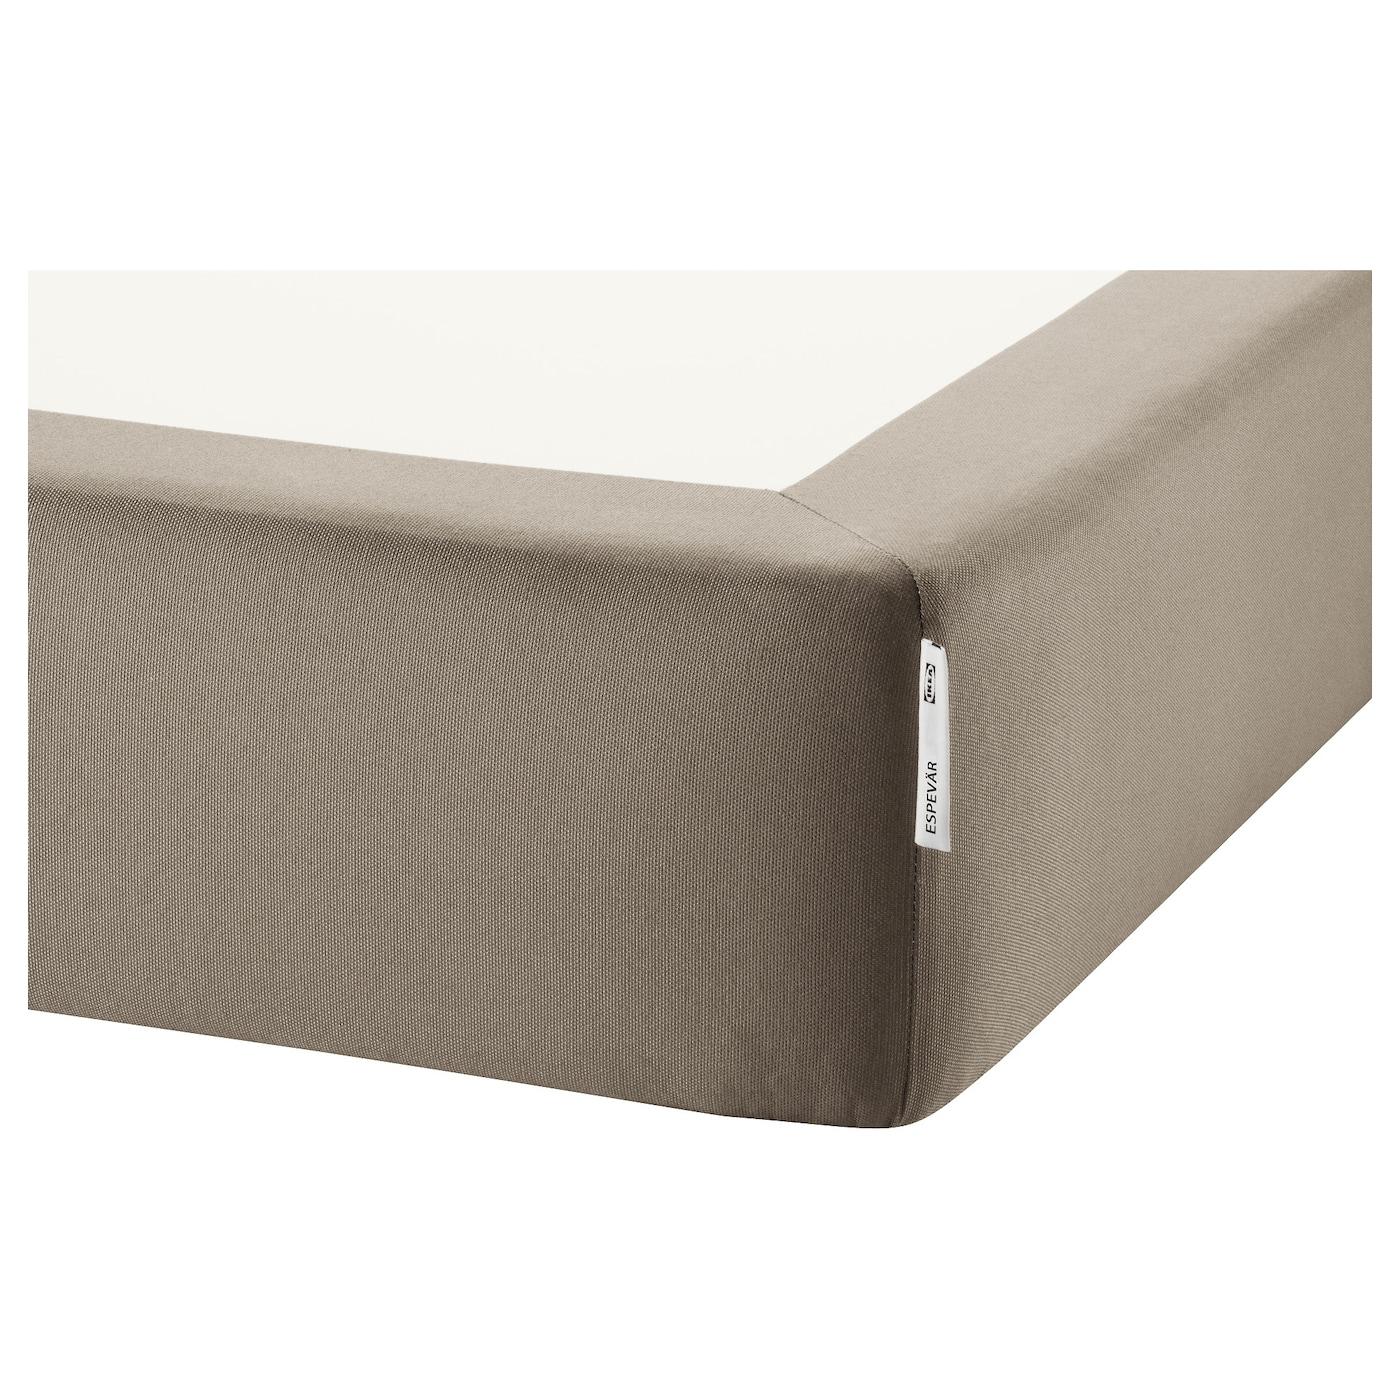 espev r matrasbodem met binnenvering donkerbeige 180x200 cm ikea. Black Bedroom Furniture Sets. Home Design Ideas